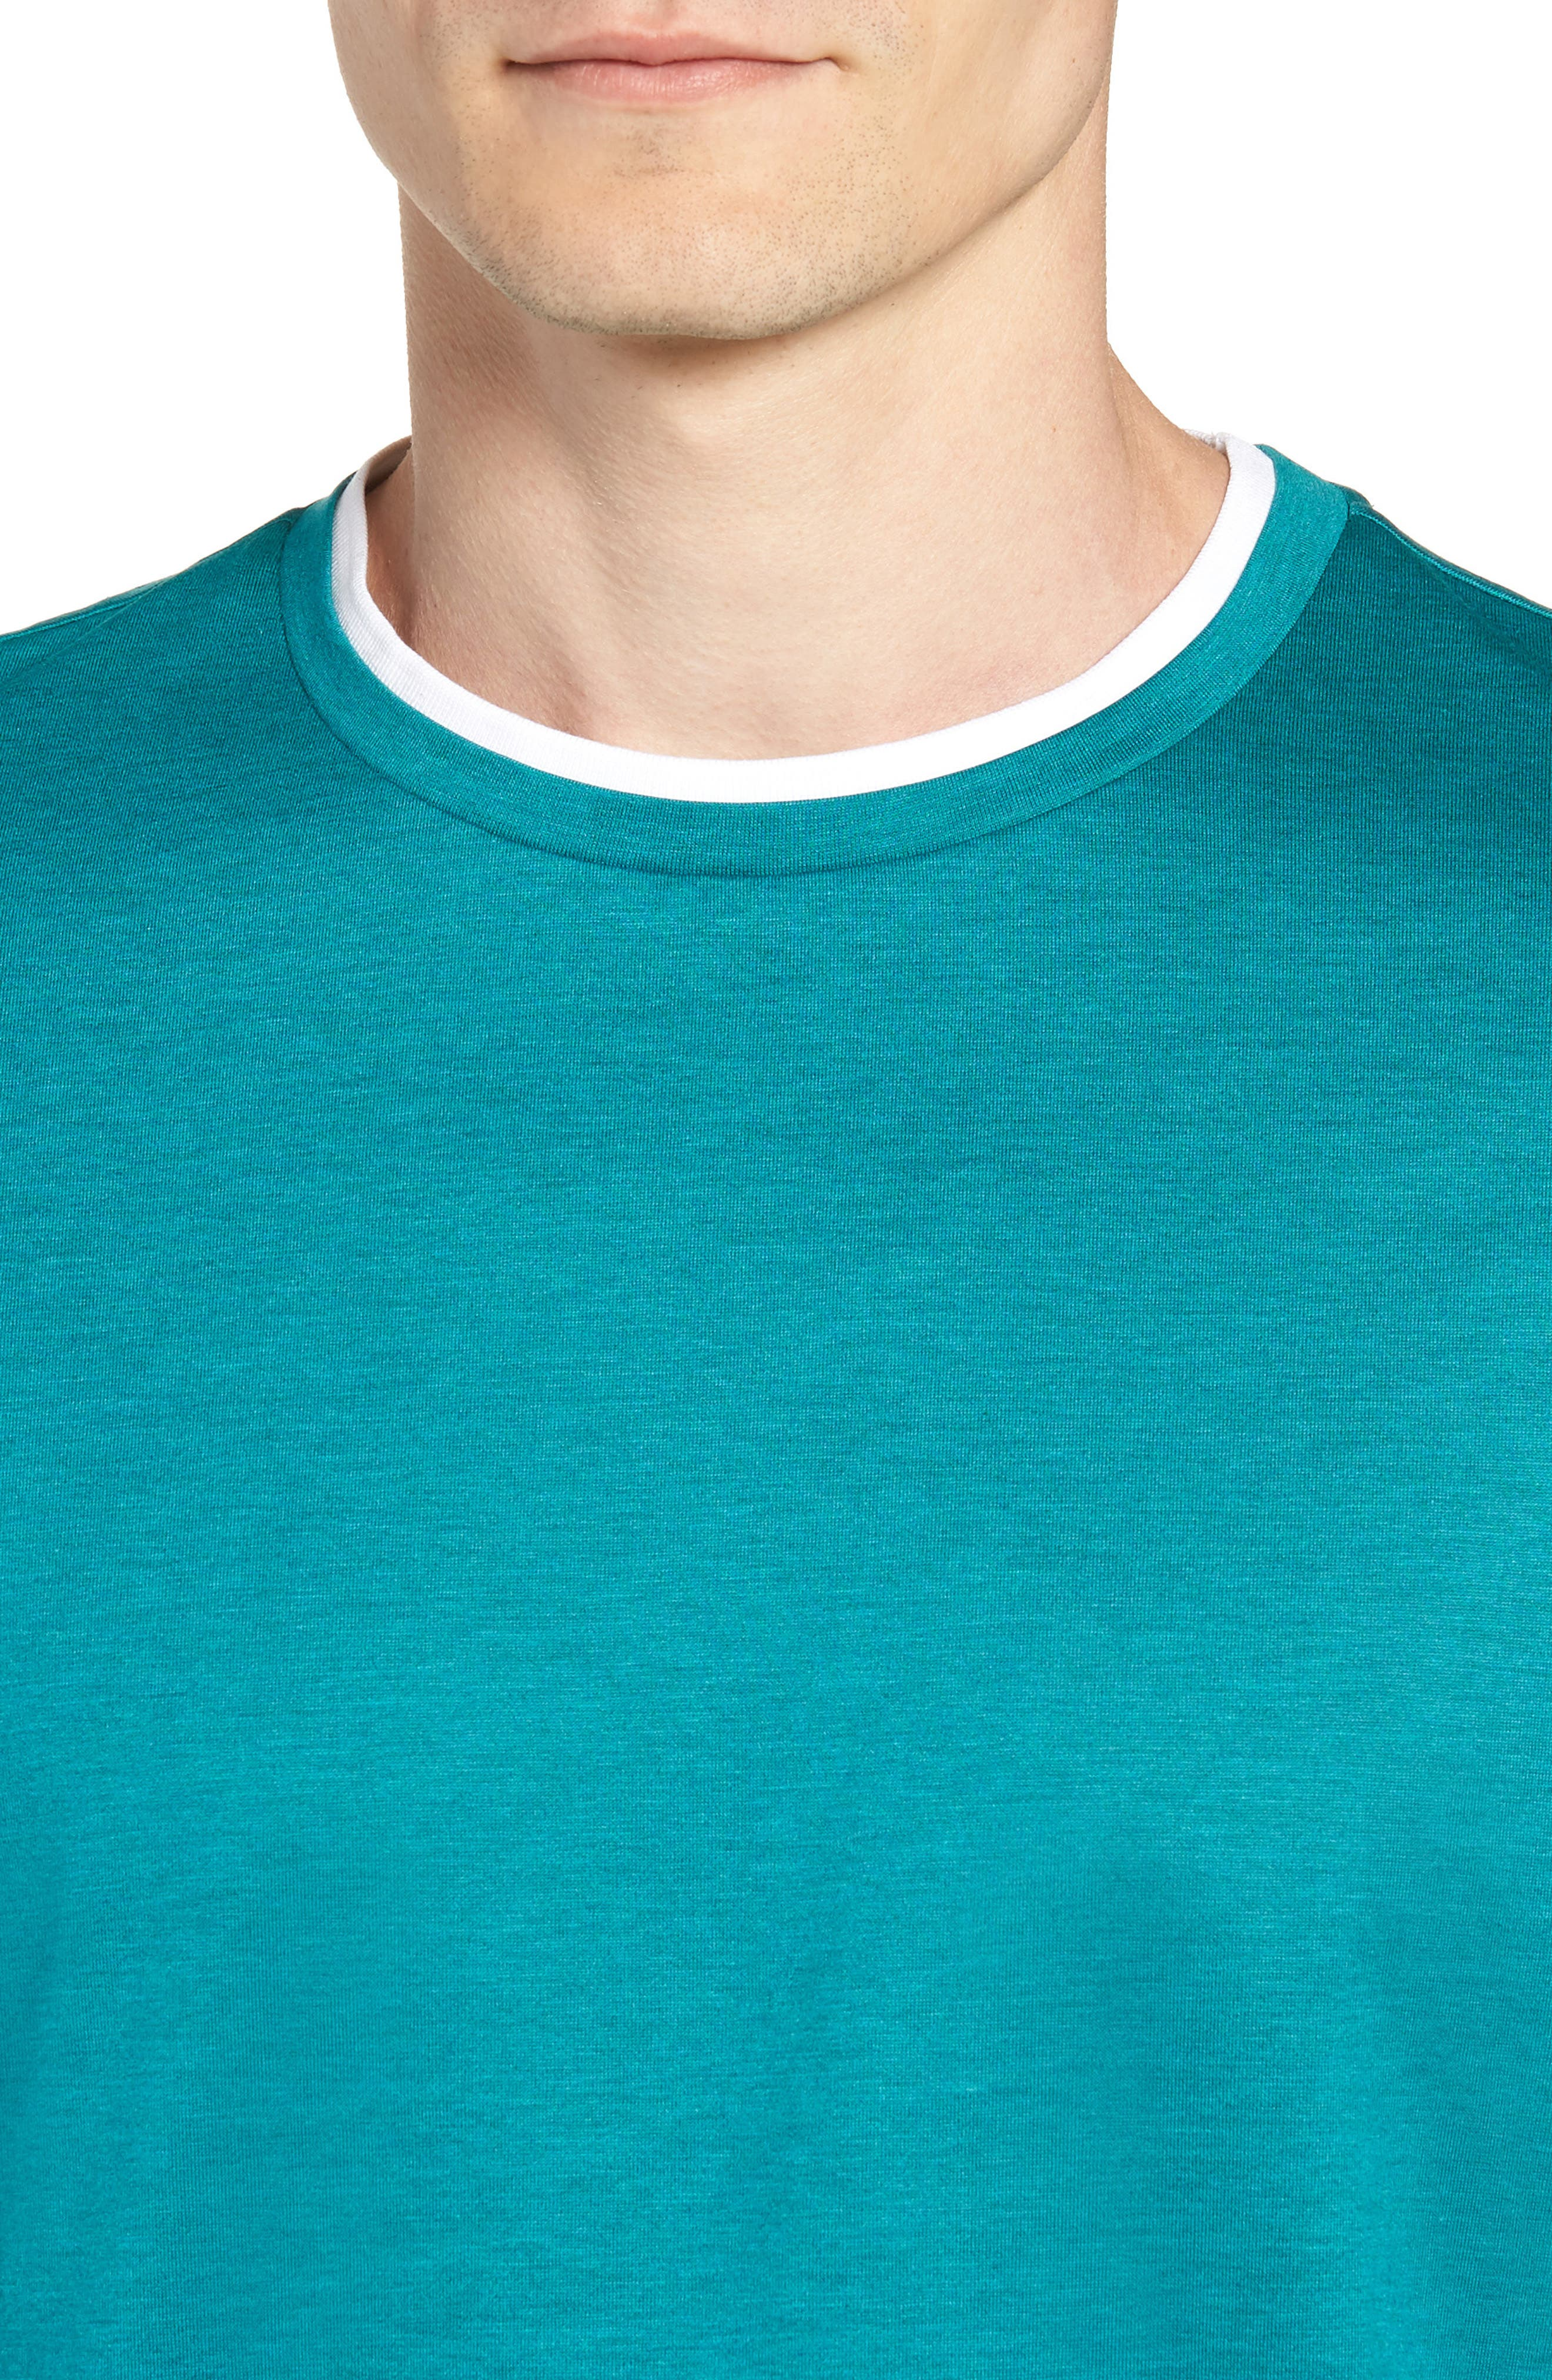 Taber Regular Fit T-Shirt,                             Alternate thumbnail 4, color,                             312